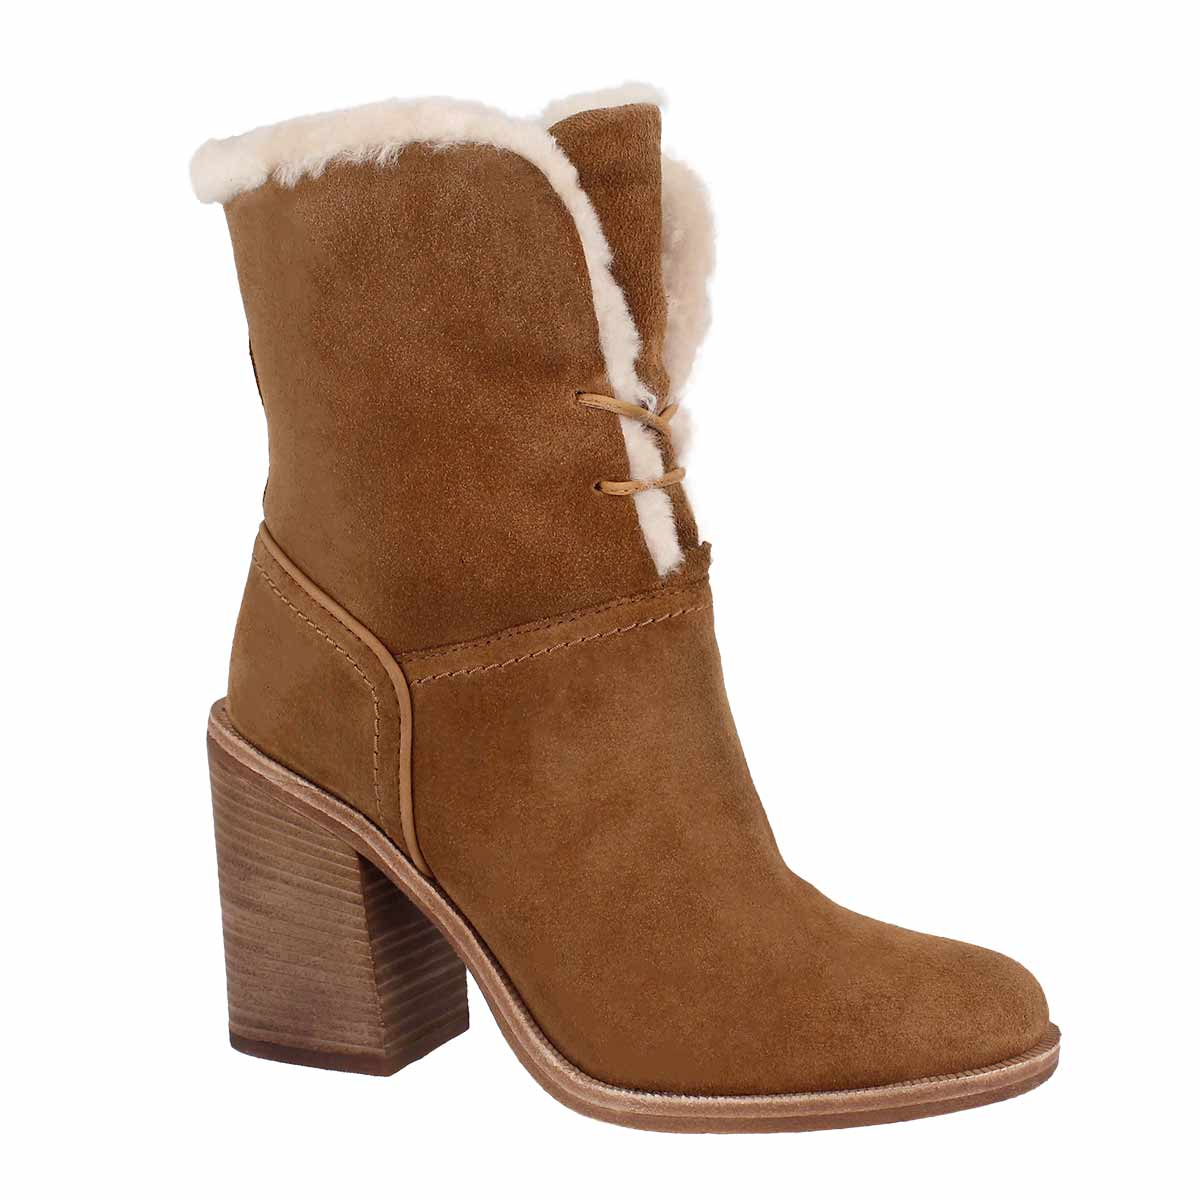 Women's JERENE chestnut casual mid calf boots